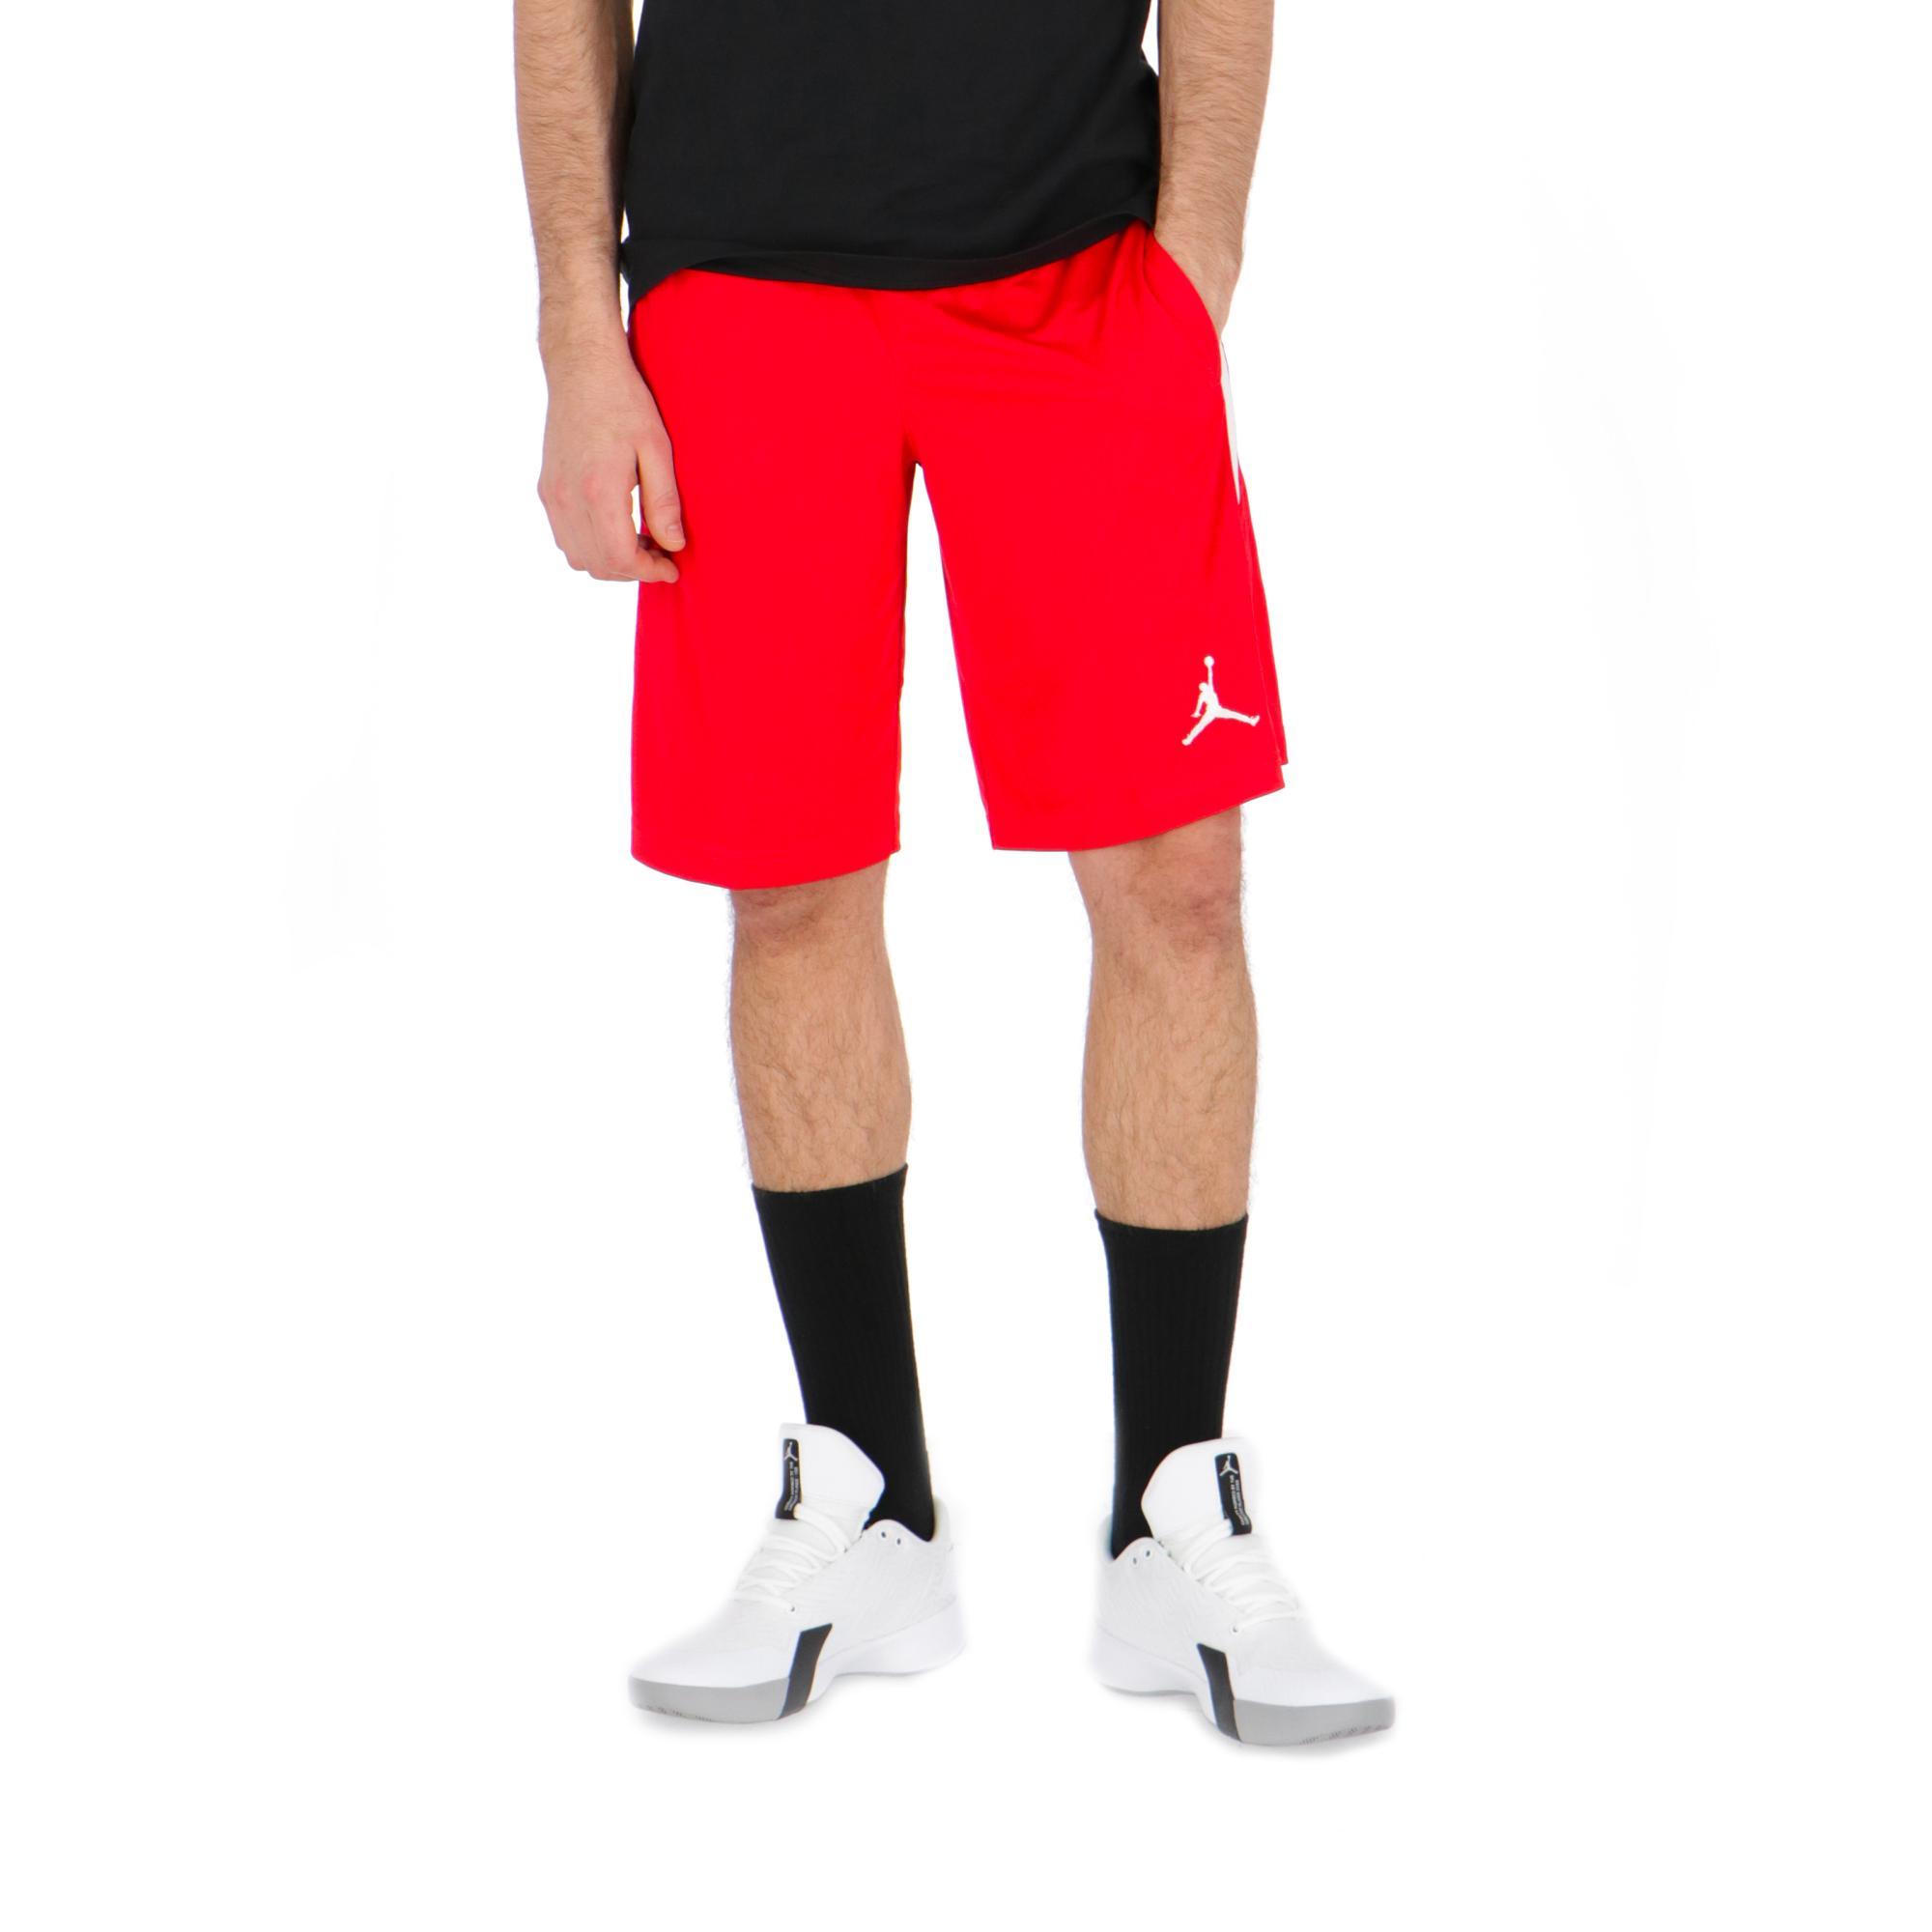 1357703918c33d MAN JERSEY SHORTS. Jordan 23 Alpha Dry Knit Short Red WHITE